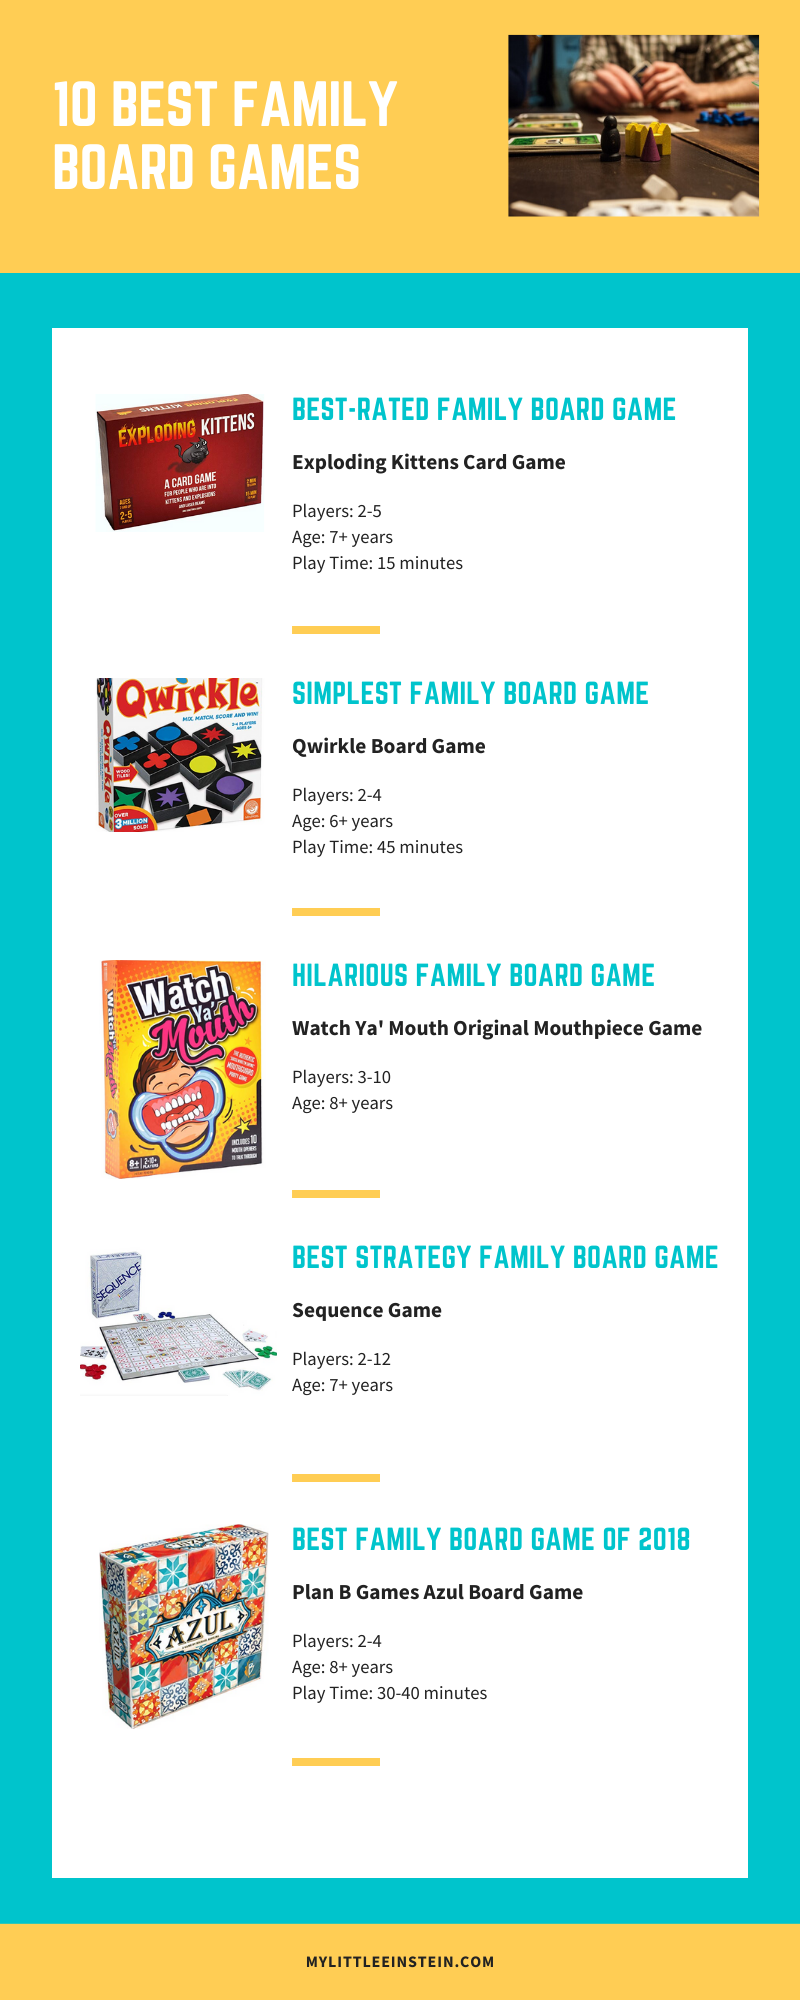 11 Best Family Board Games In Amazon Best Family Board Games